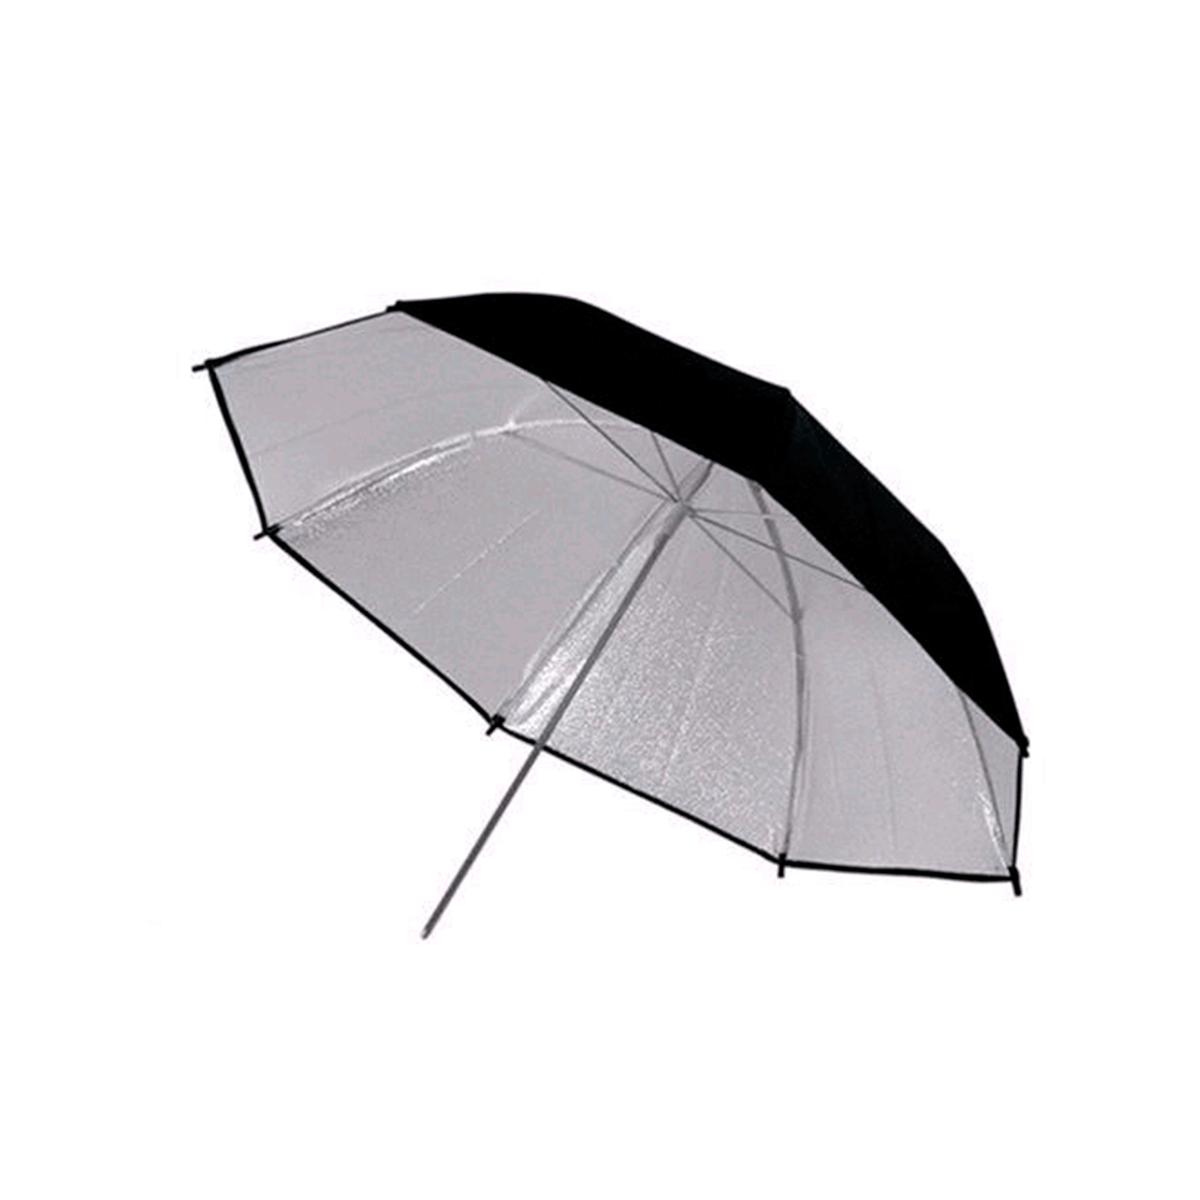 Sombrinha Refletora Reversível Preta, Prata e Branca 91cm Greika YU-303  - Fotolux